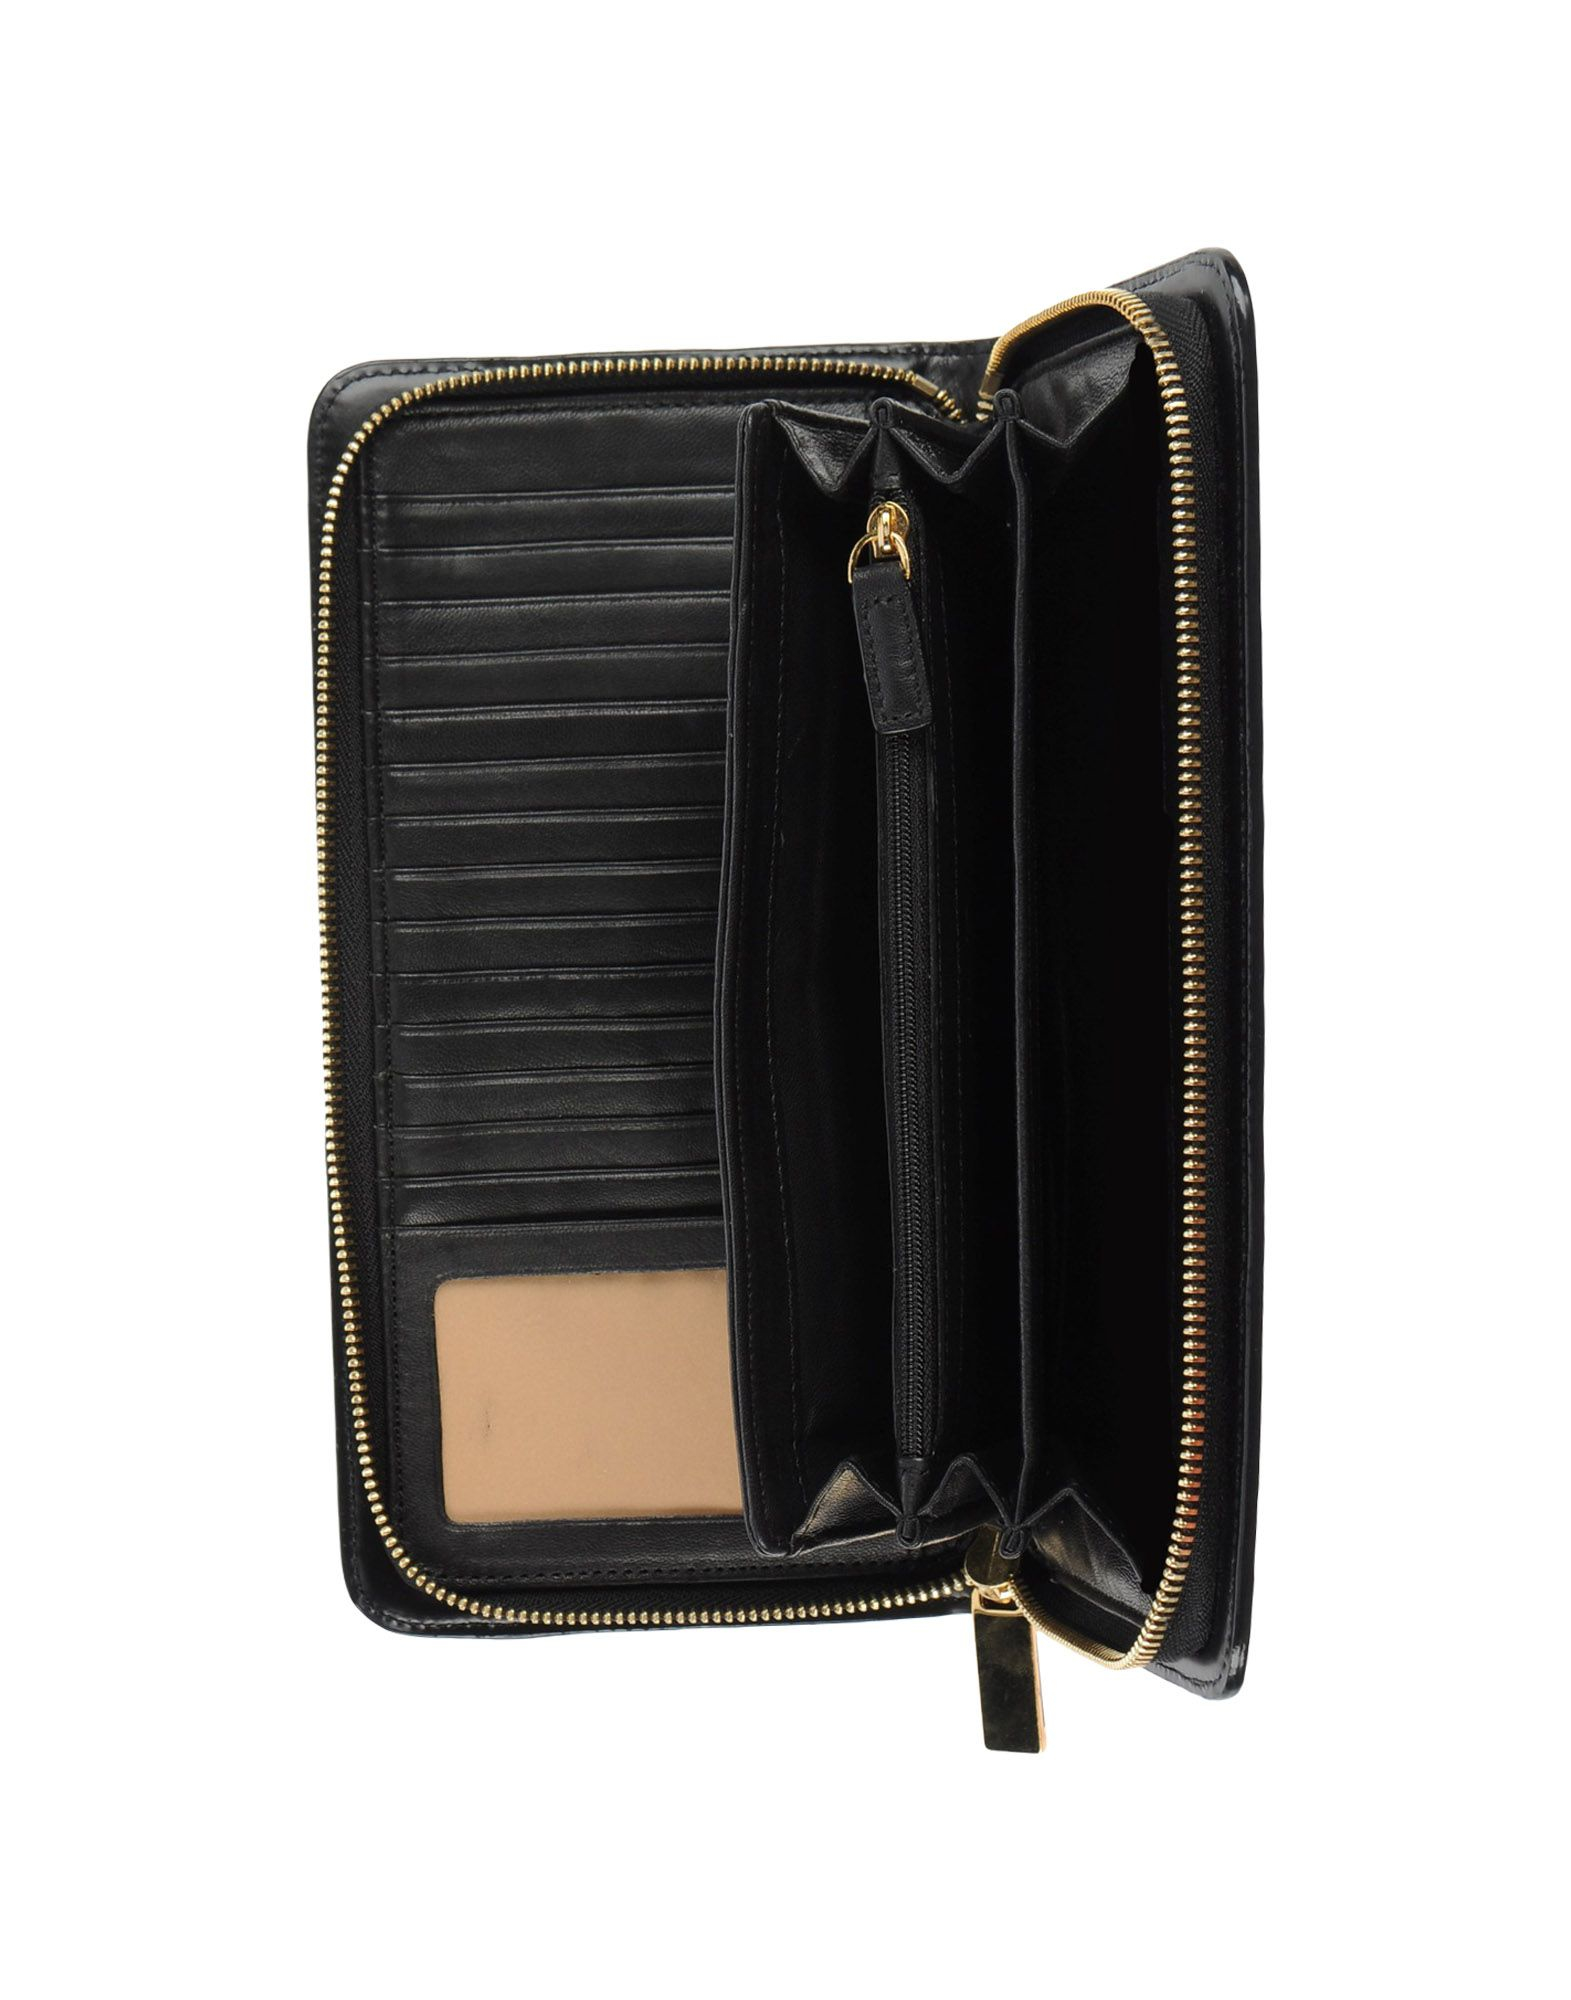 michael kors black wallets for women car interior design